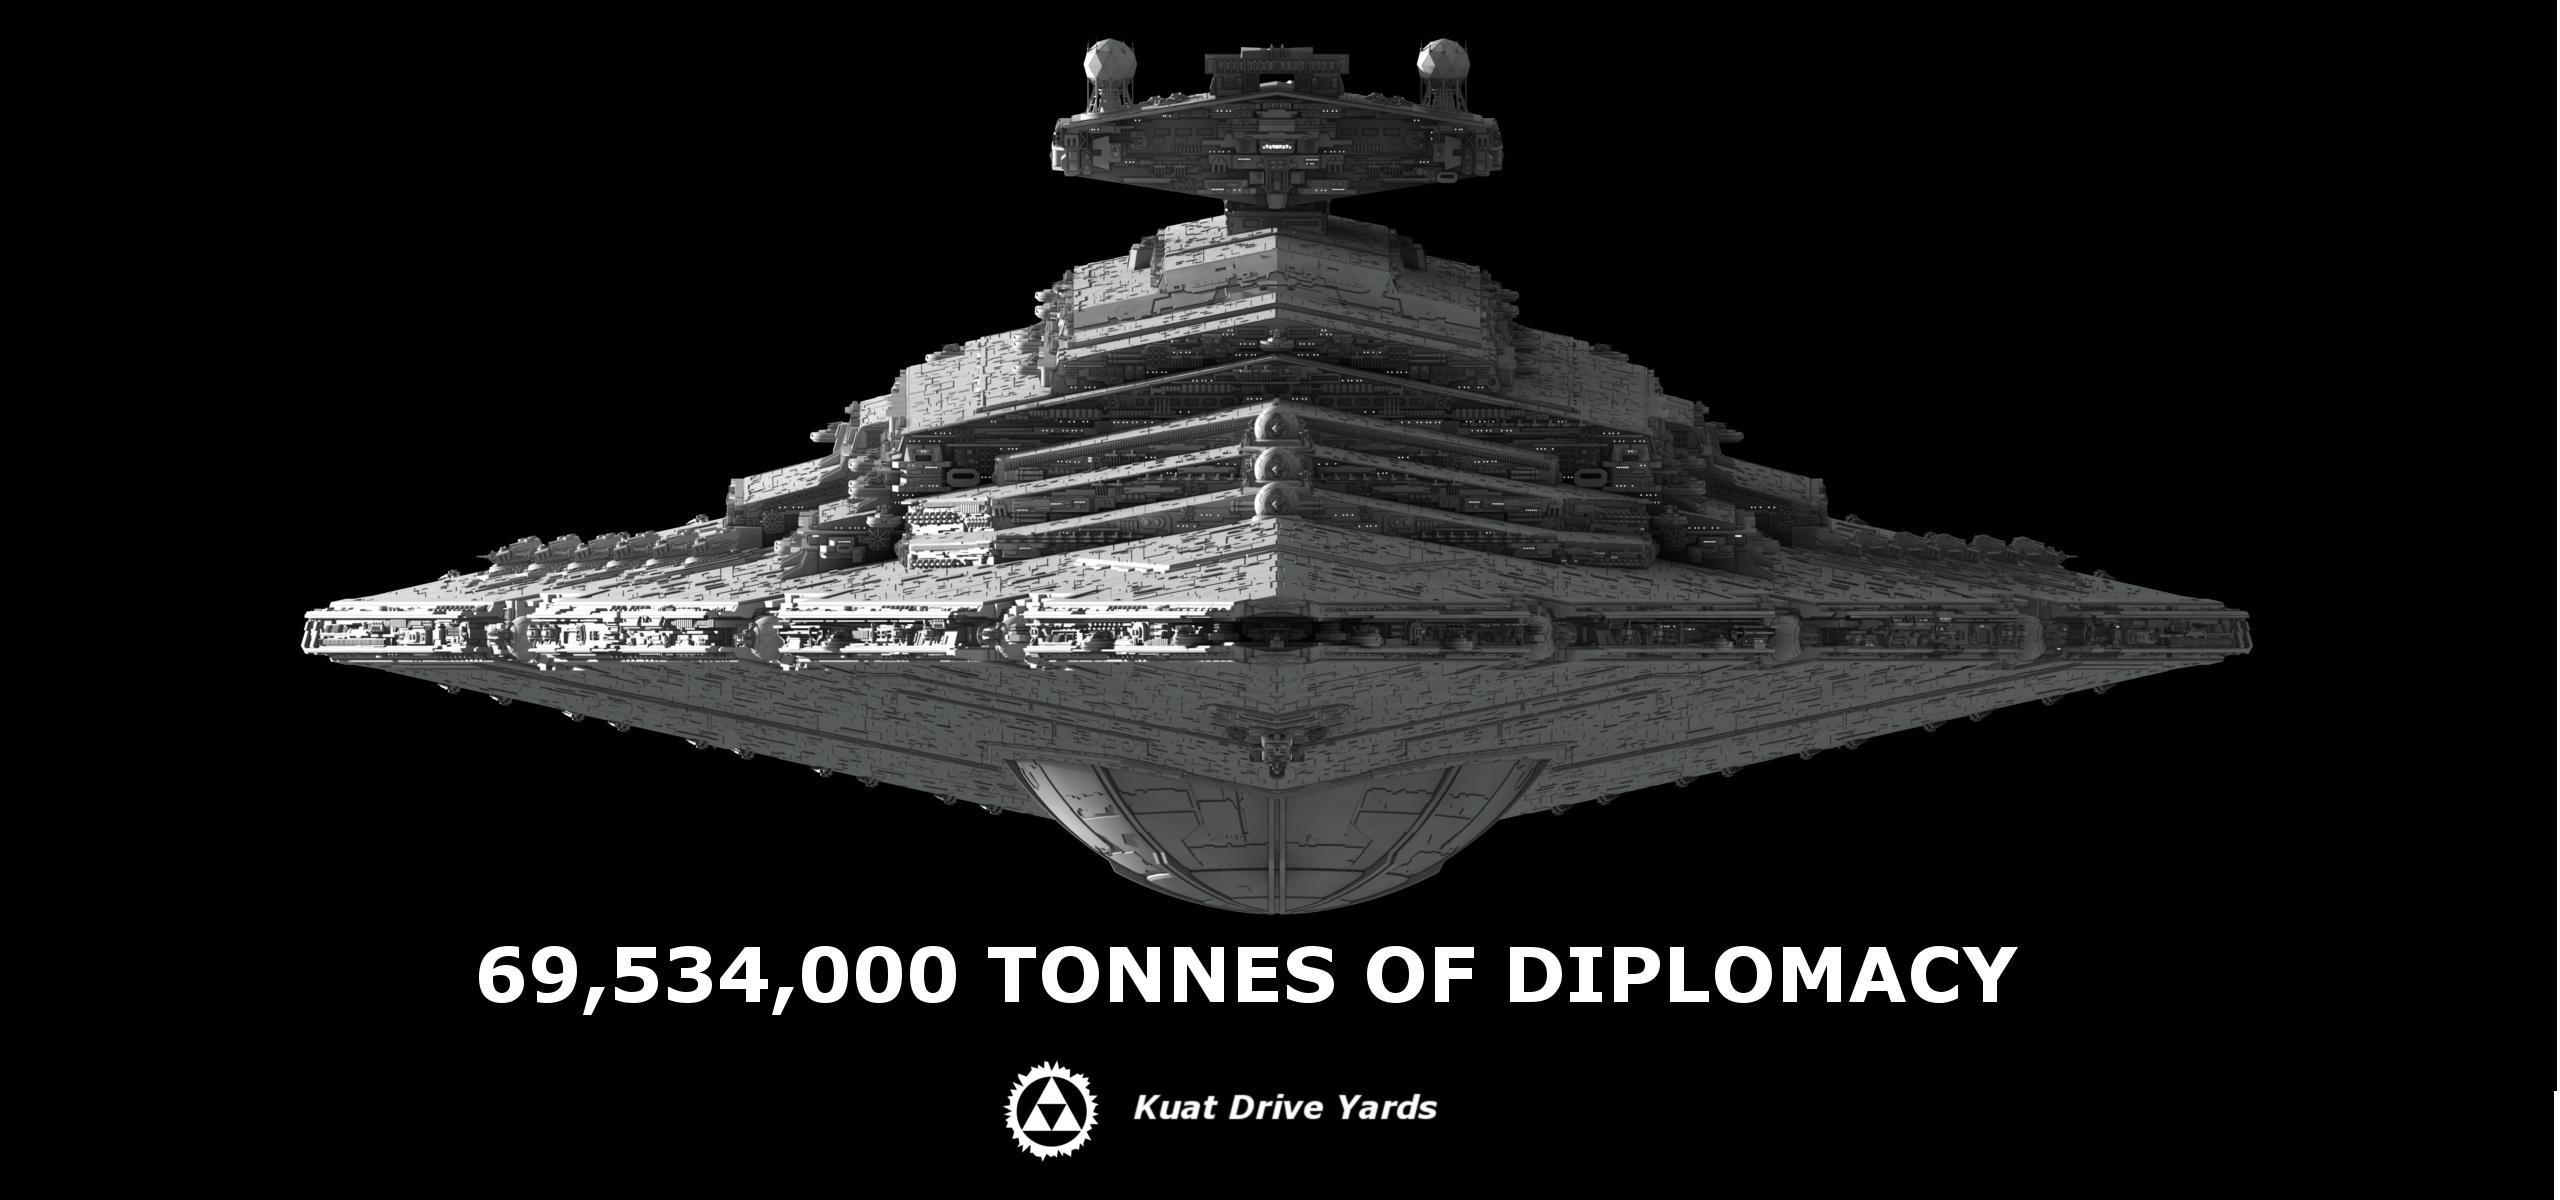 69,534,000 Tonnes of Diplomacy